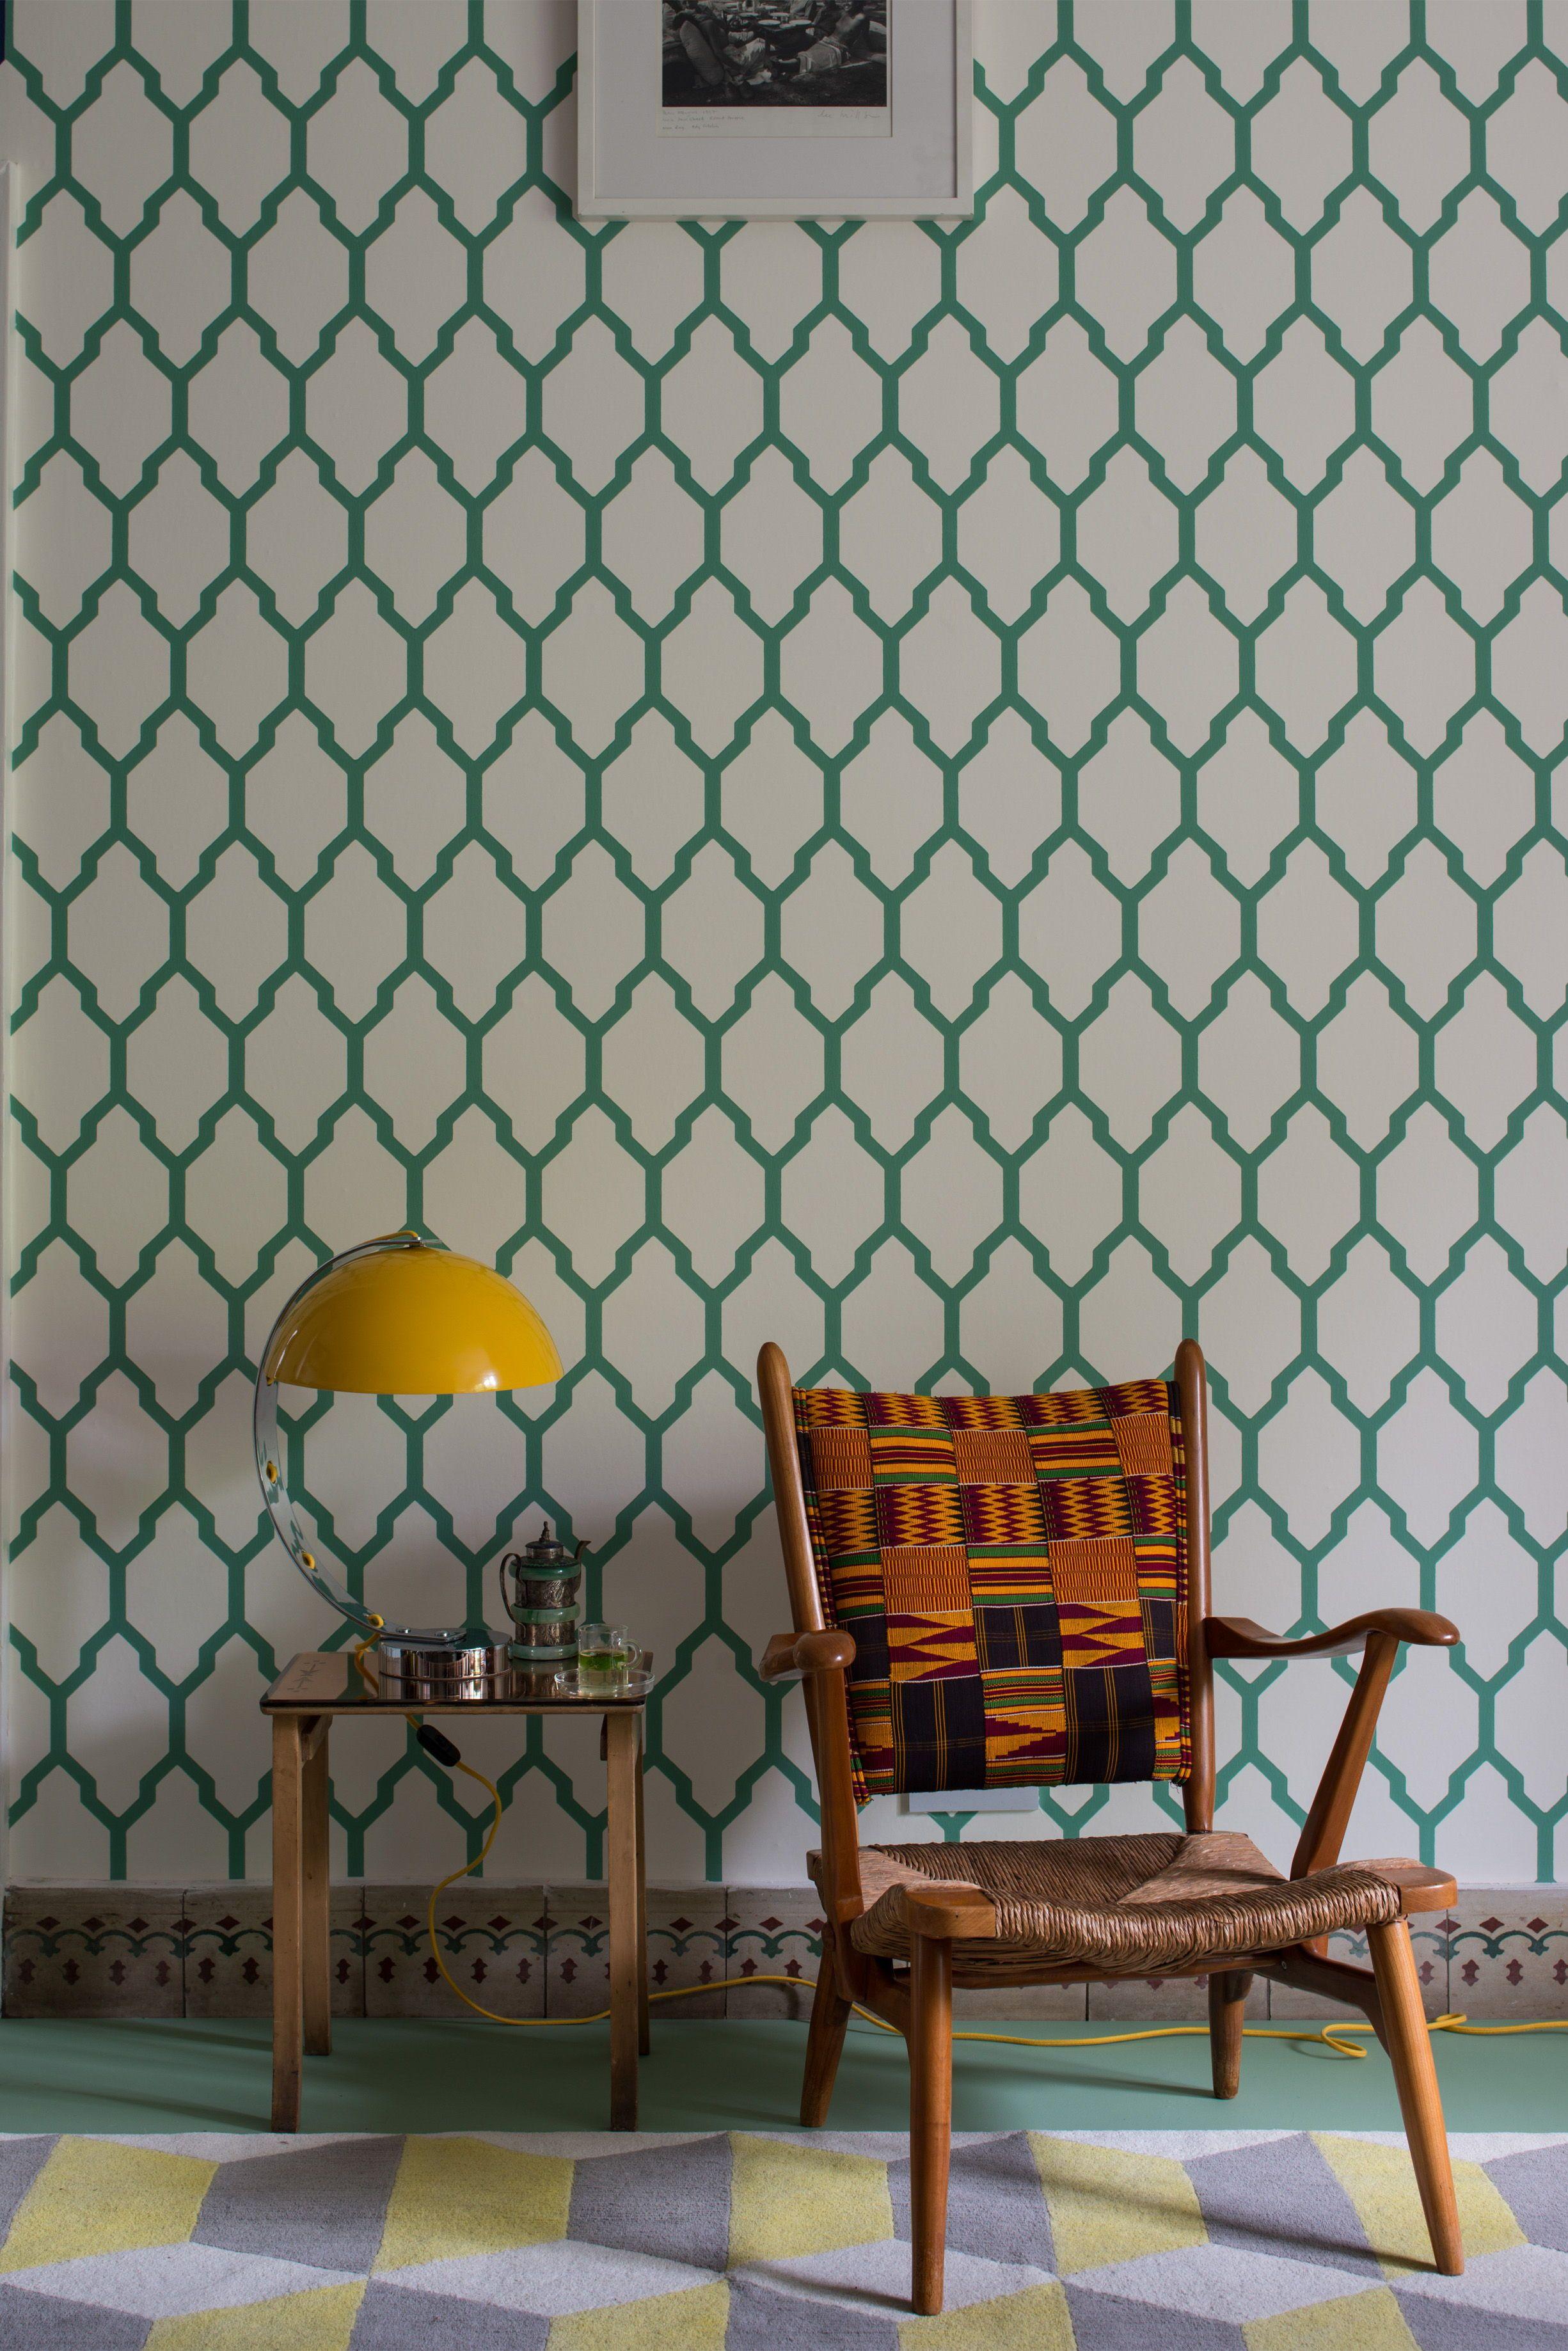 Tessella by Farrow & Ball - Green - Wallpaper - BP 3603 in ...